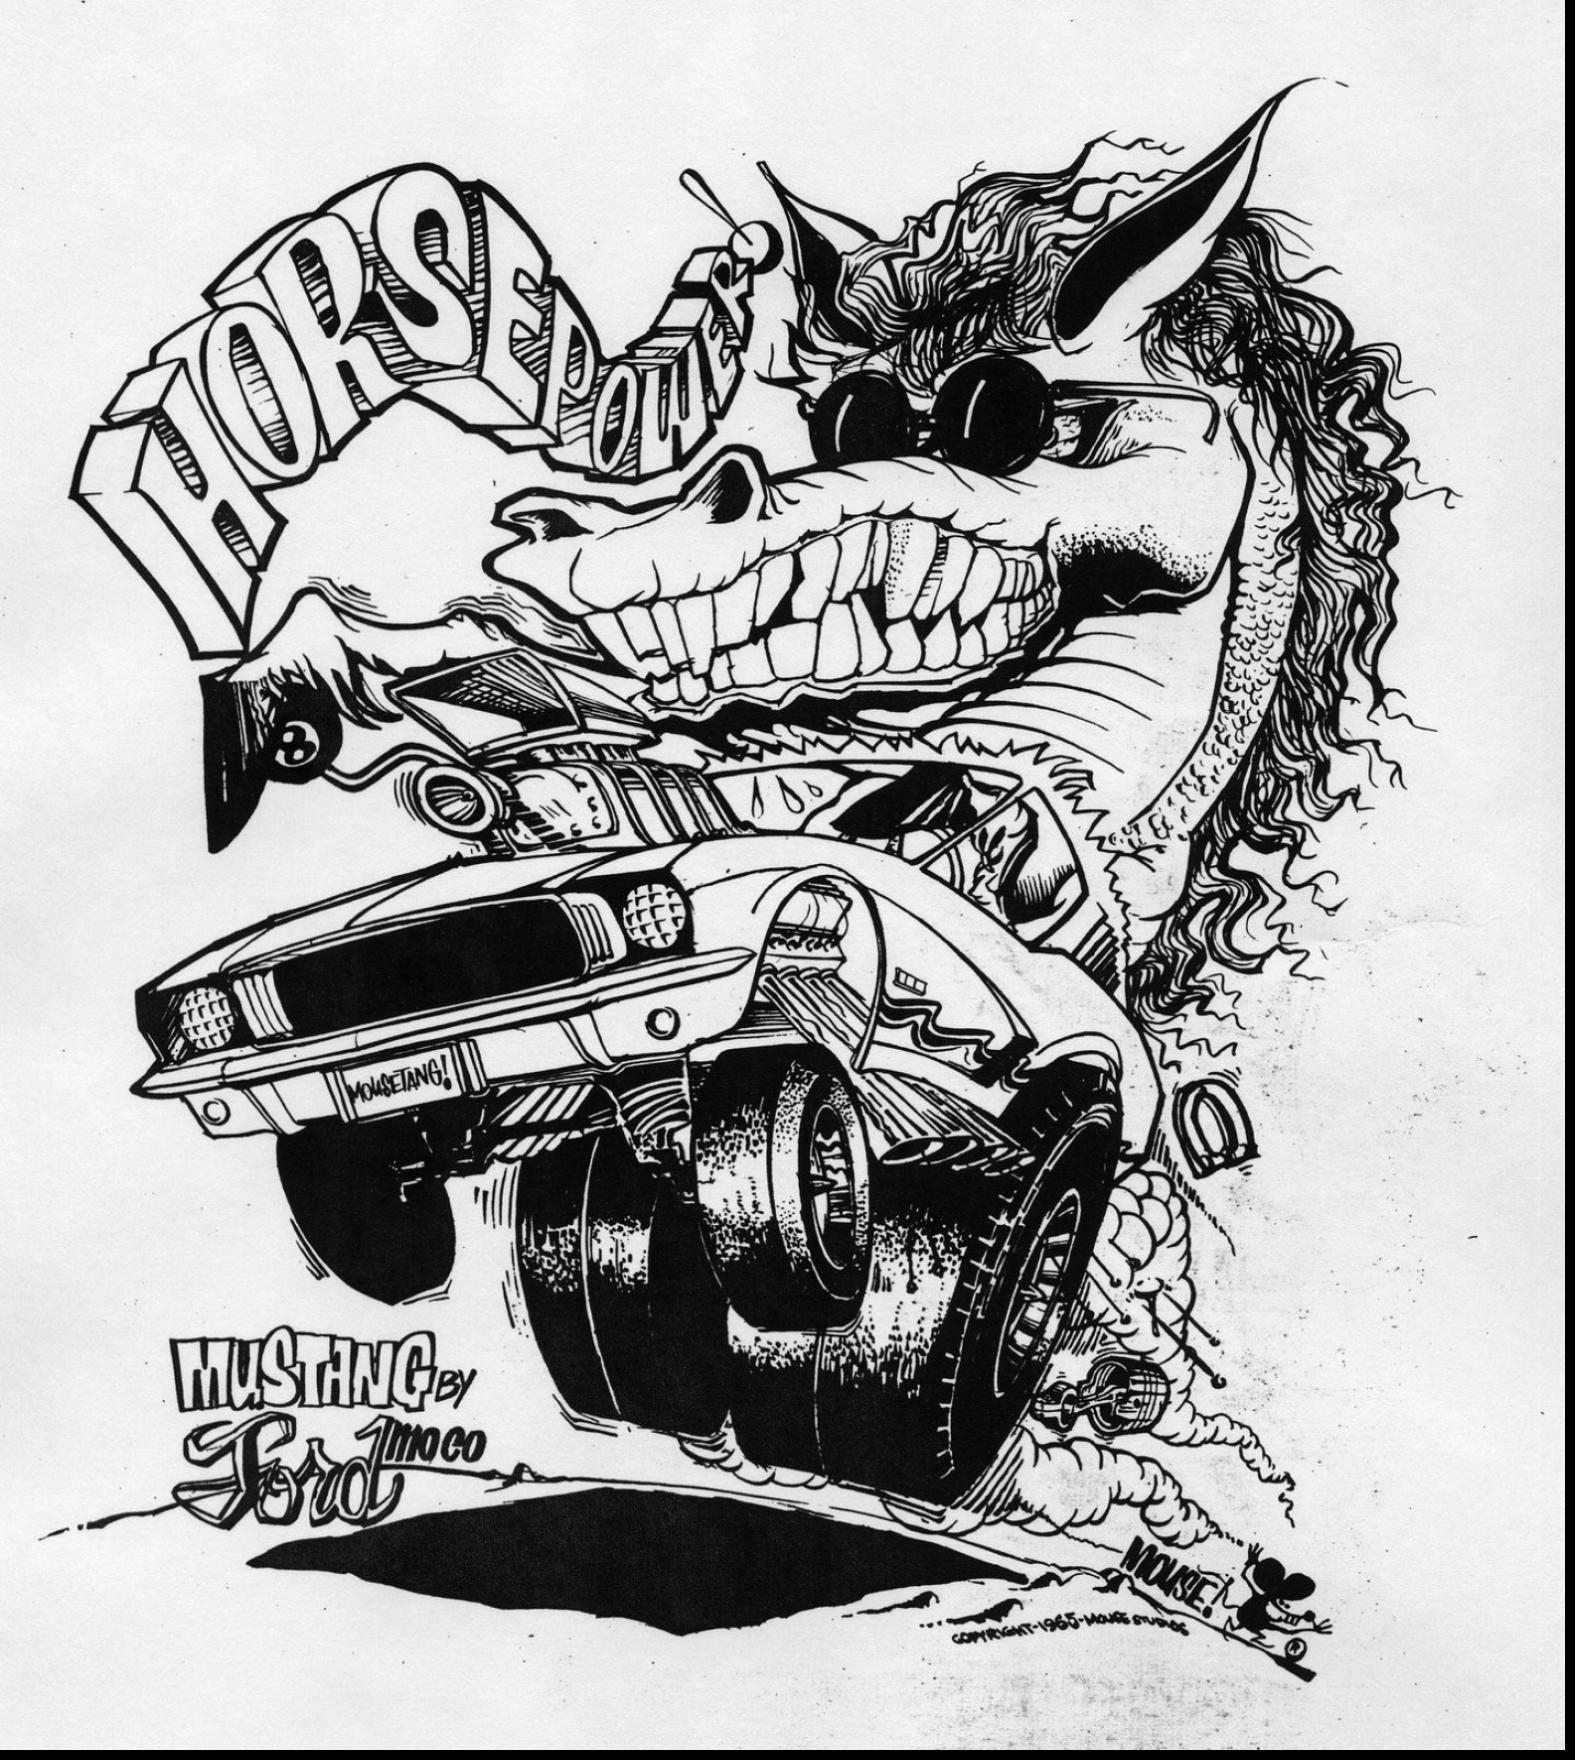 Excellent Rat Fink Hot Rod Coloring With Hot Rod Coloring Pages And Hot Rod Coloring Pictures Biker Art Kustom Kulture Art Art